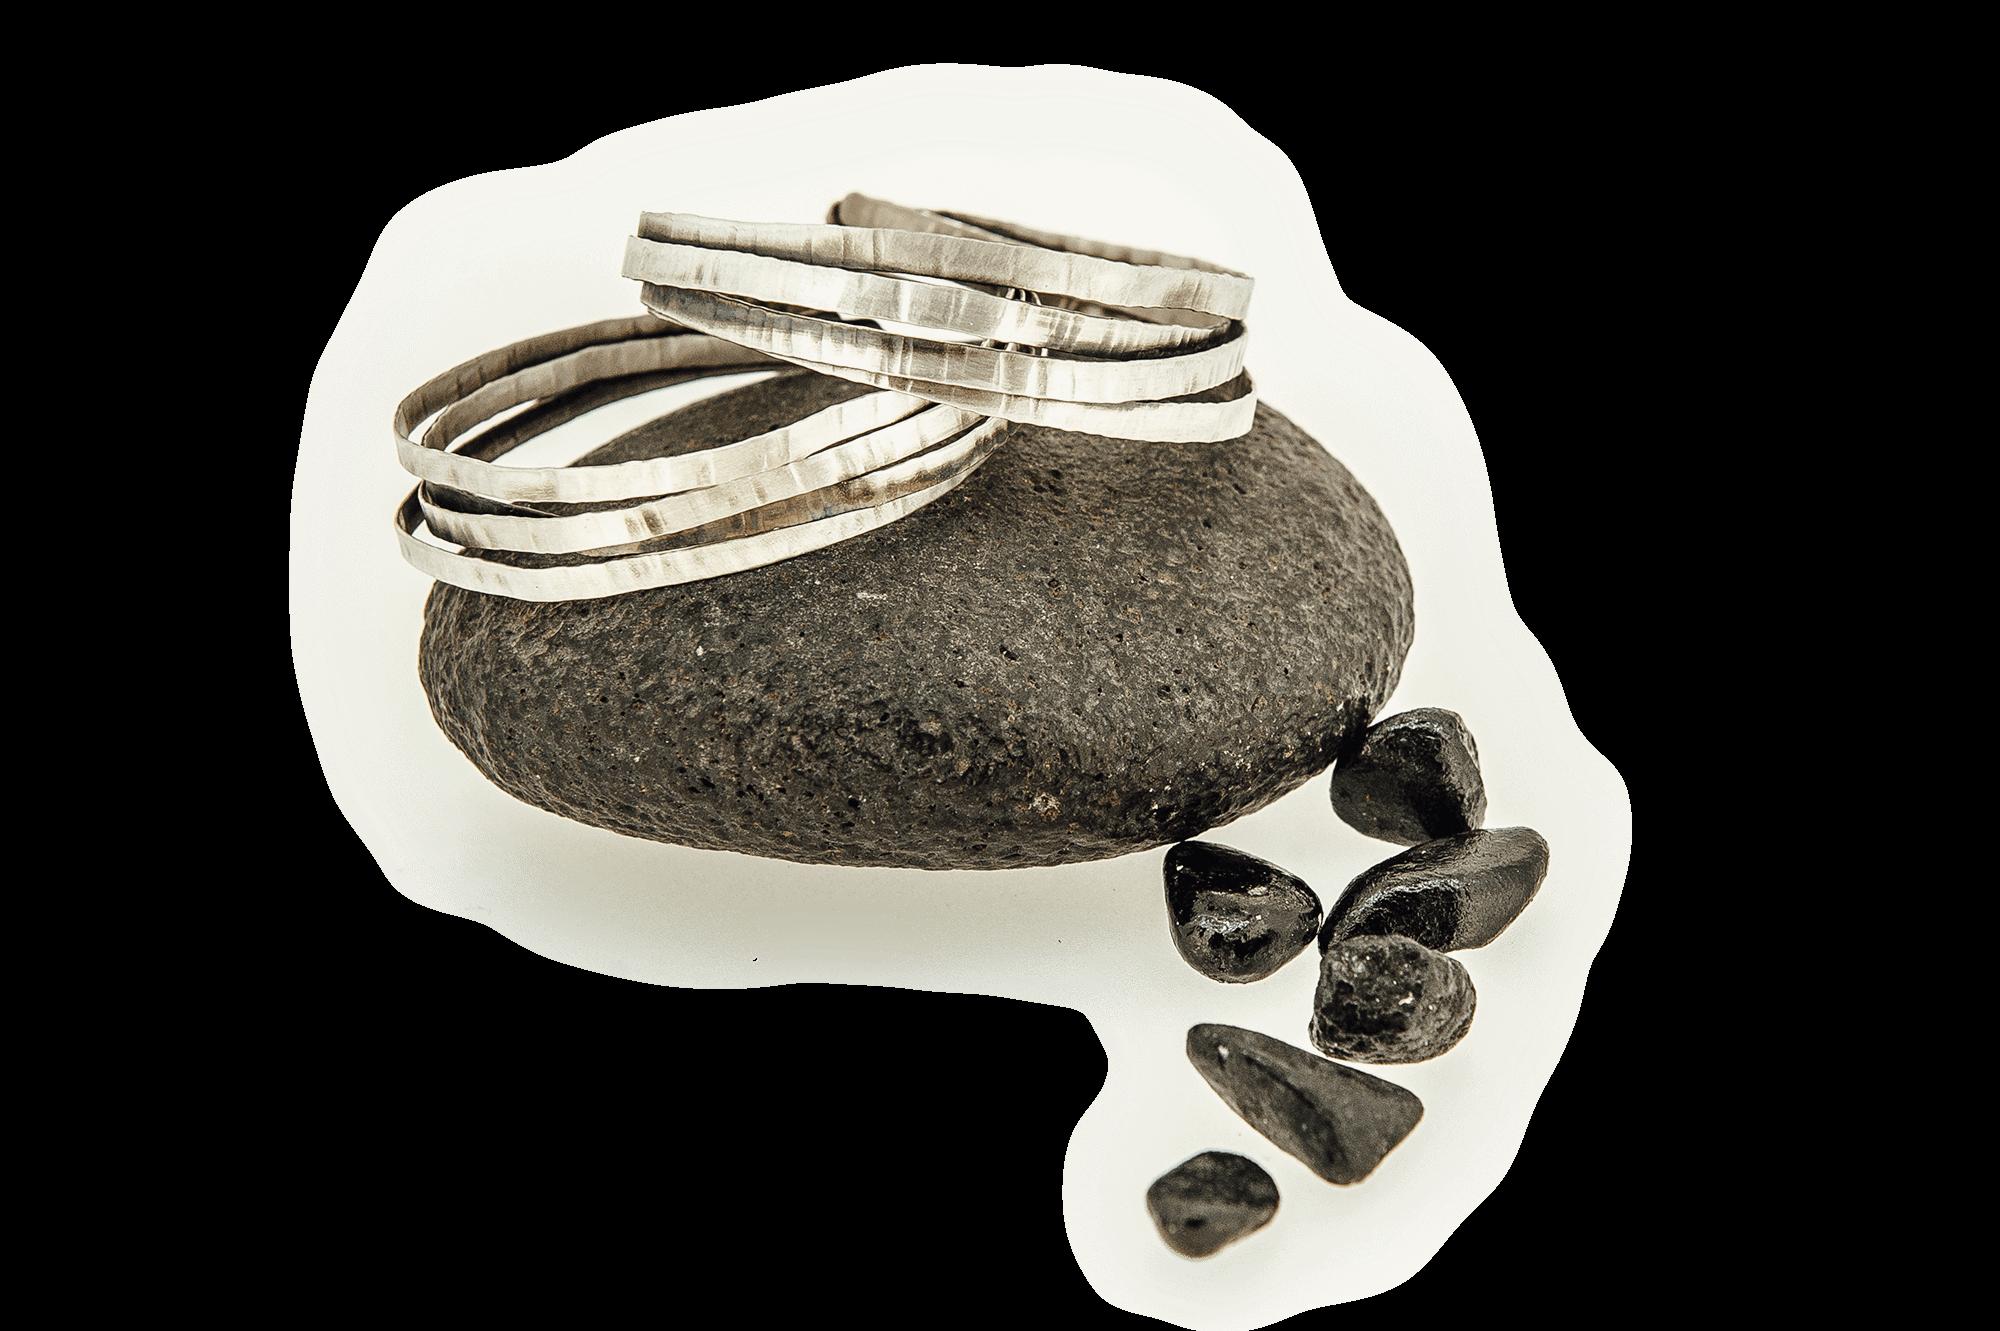 brazaletes de plata artesanía de gipuzkoa ziku